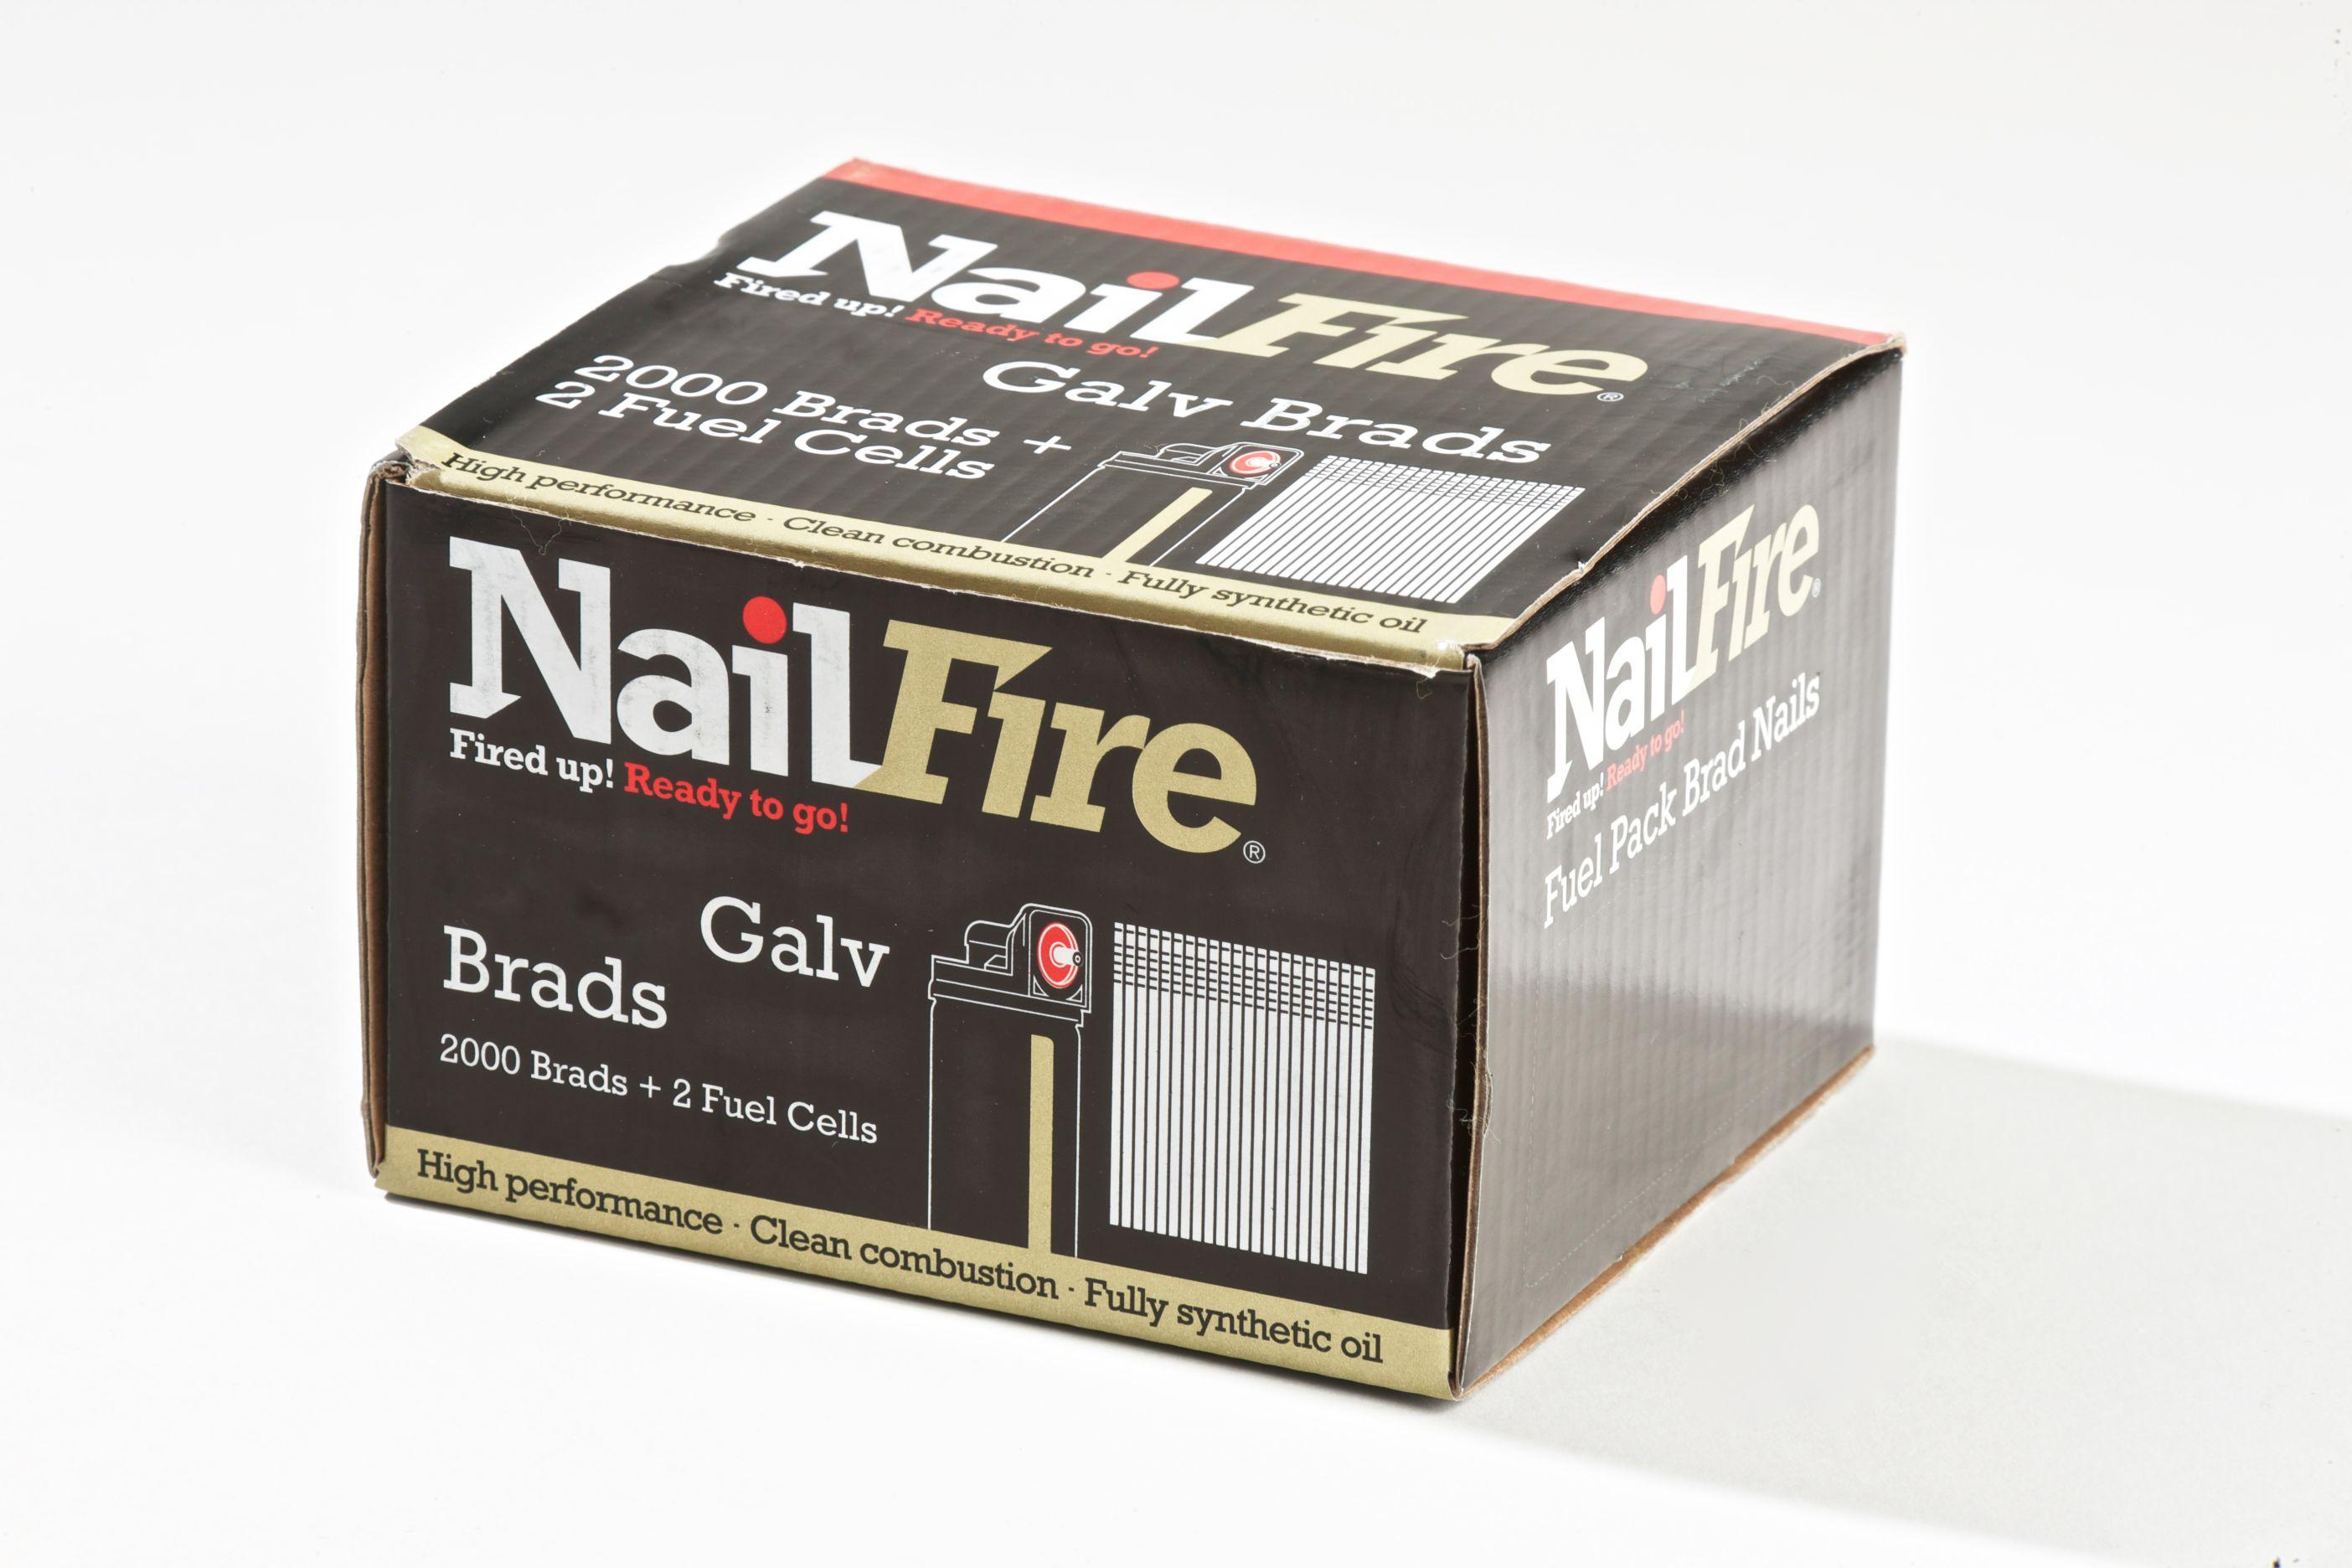 NAILFIRE 2ND FIX STRAIGHT E-GALV BRAD & FUEL PACK 50MM (TUB OF 2000)